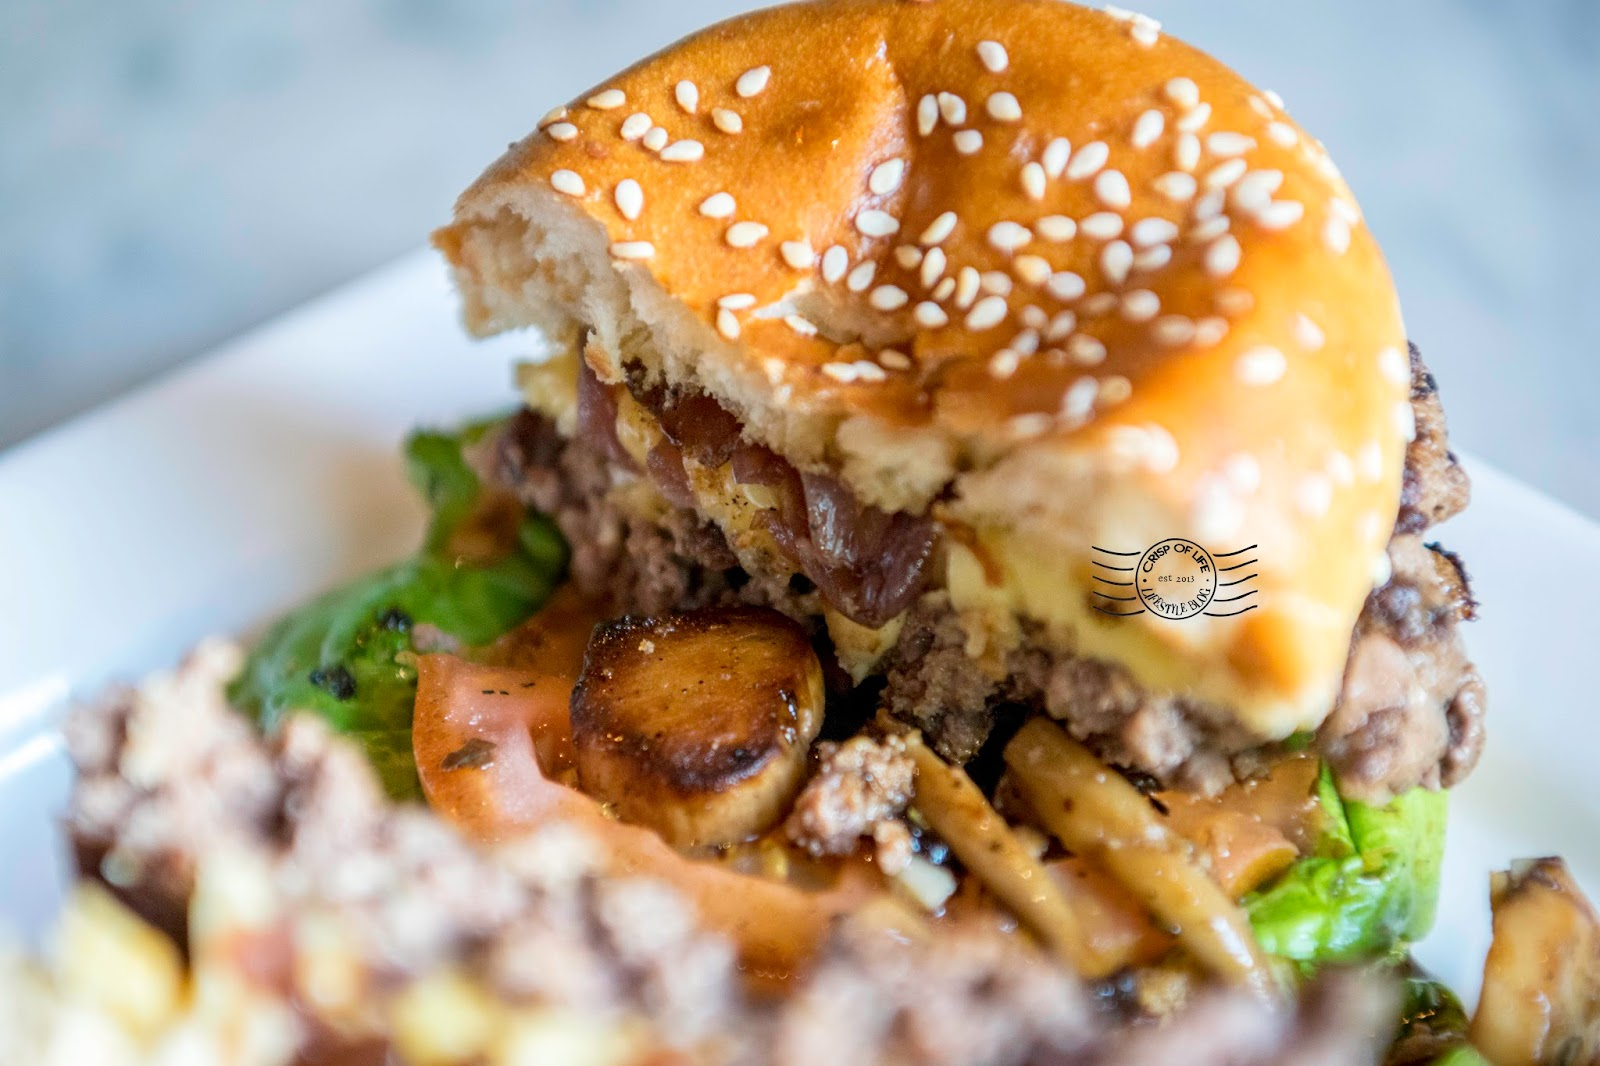 Junk Cafe burger chulia street penang